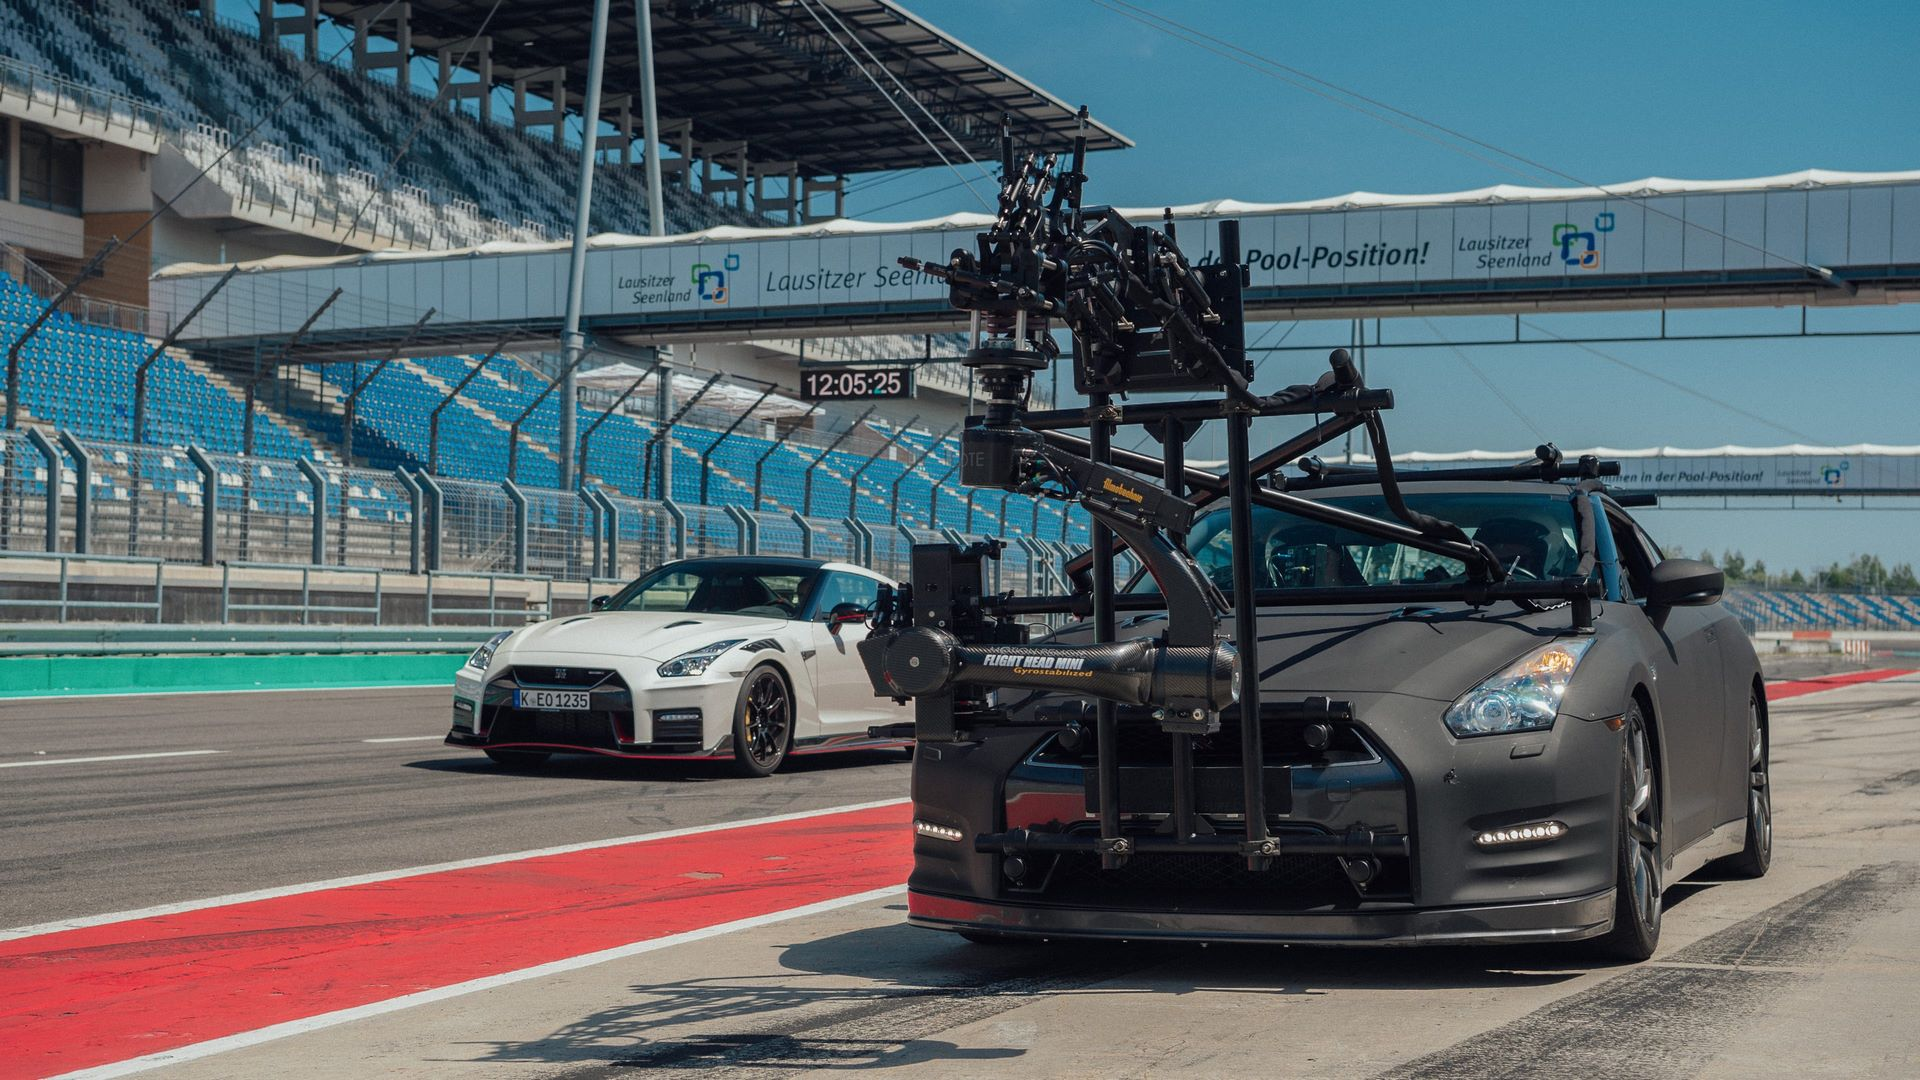 Nissan-GT-R-Camera-Car-7